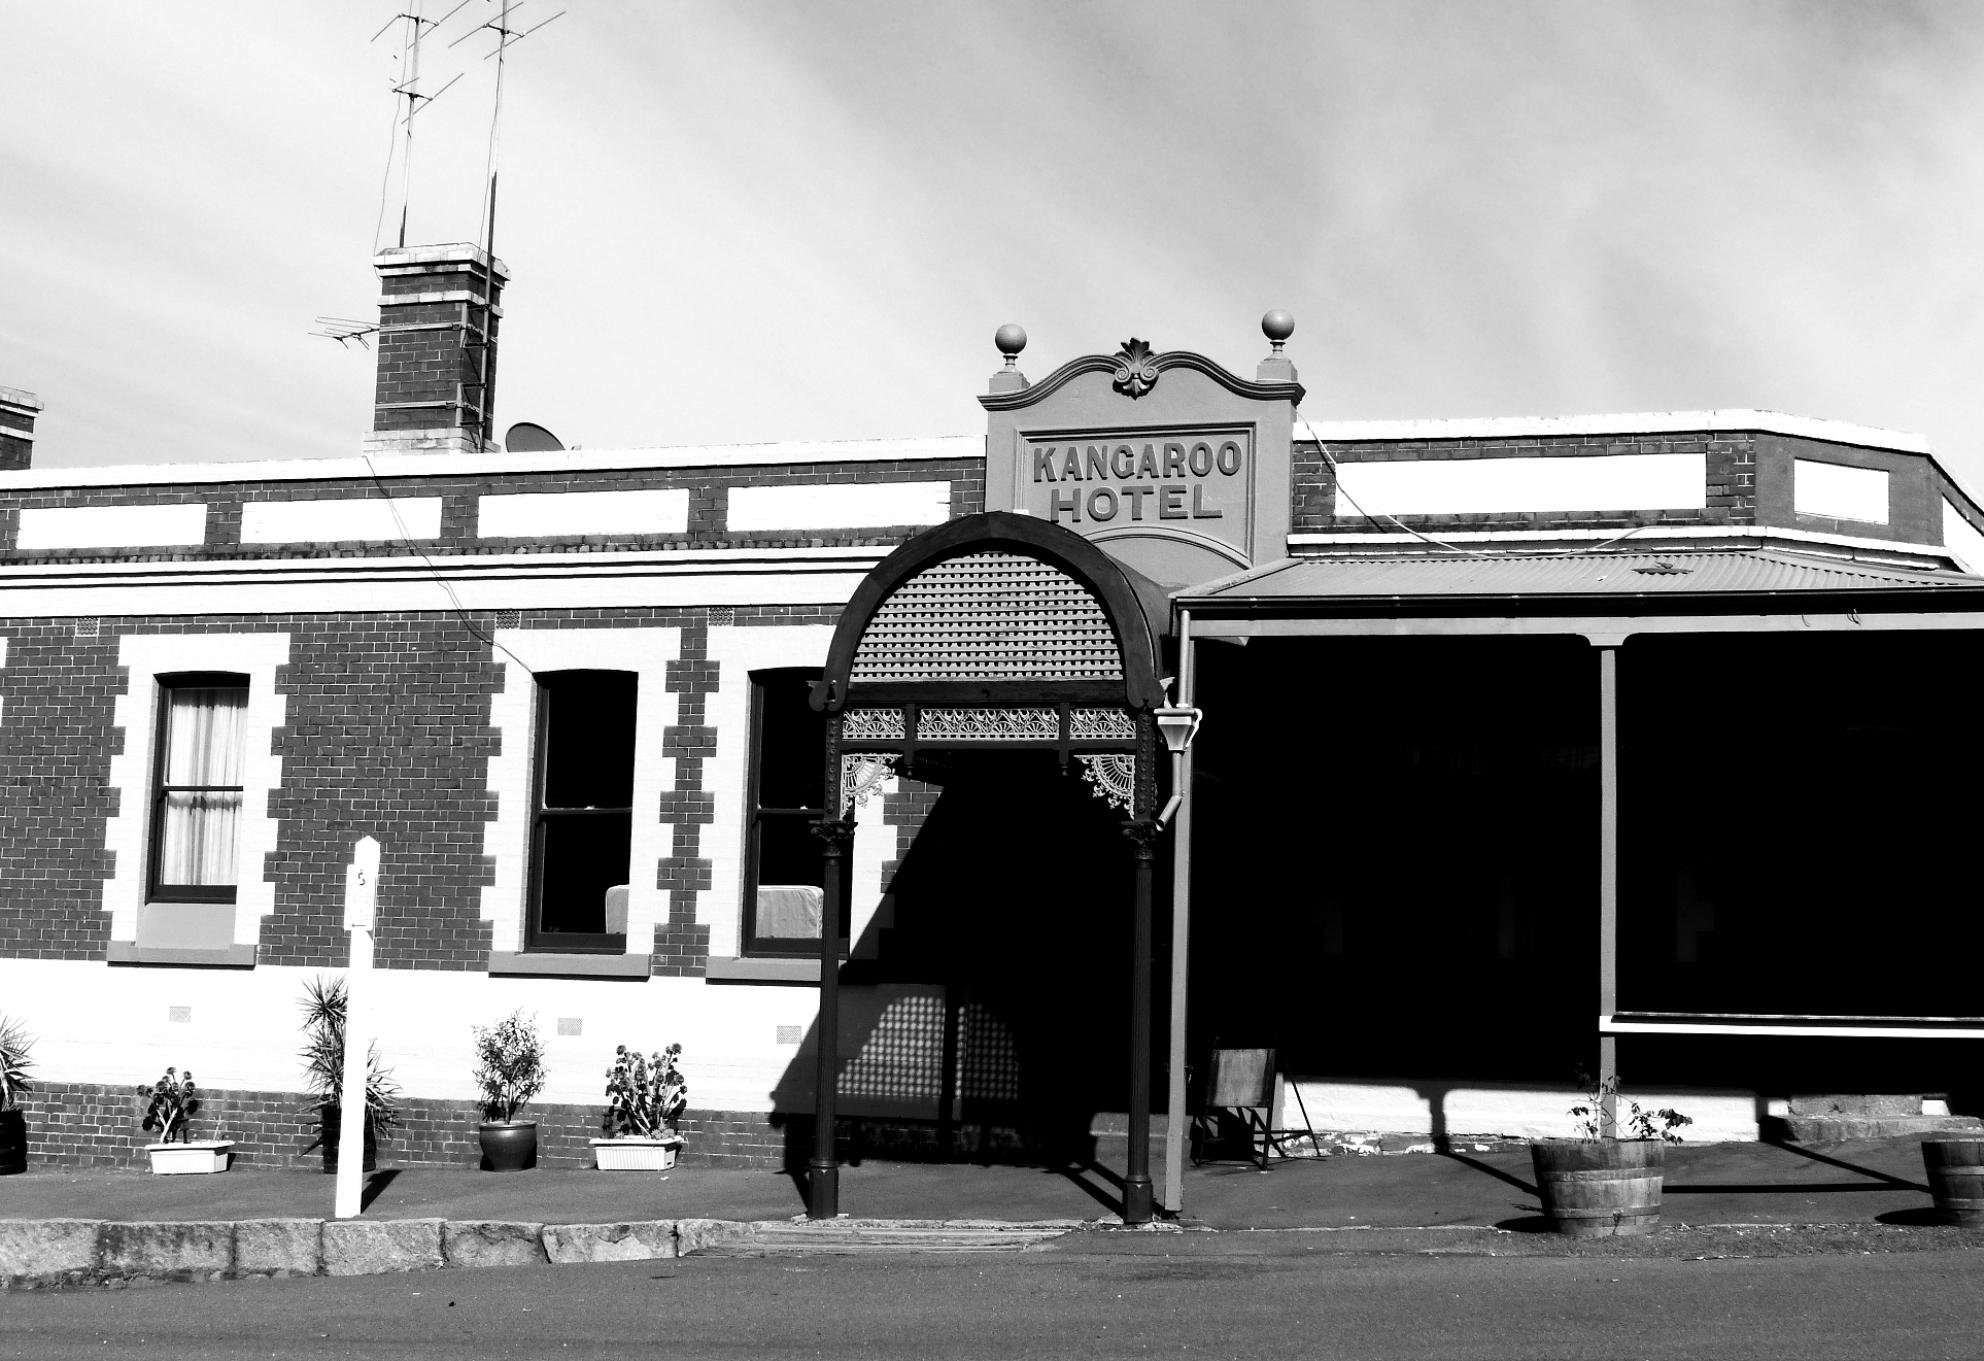 Kangaroo Hotel